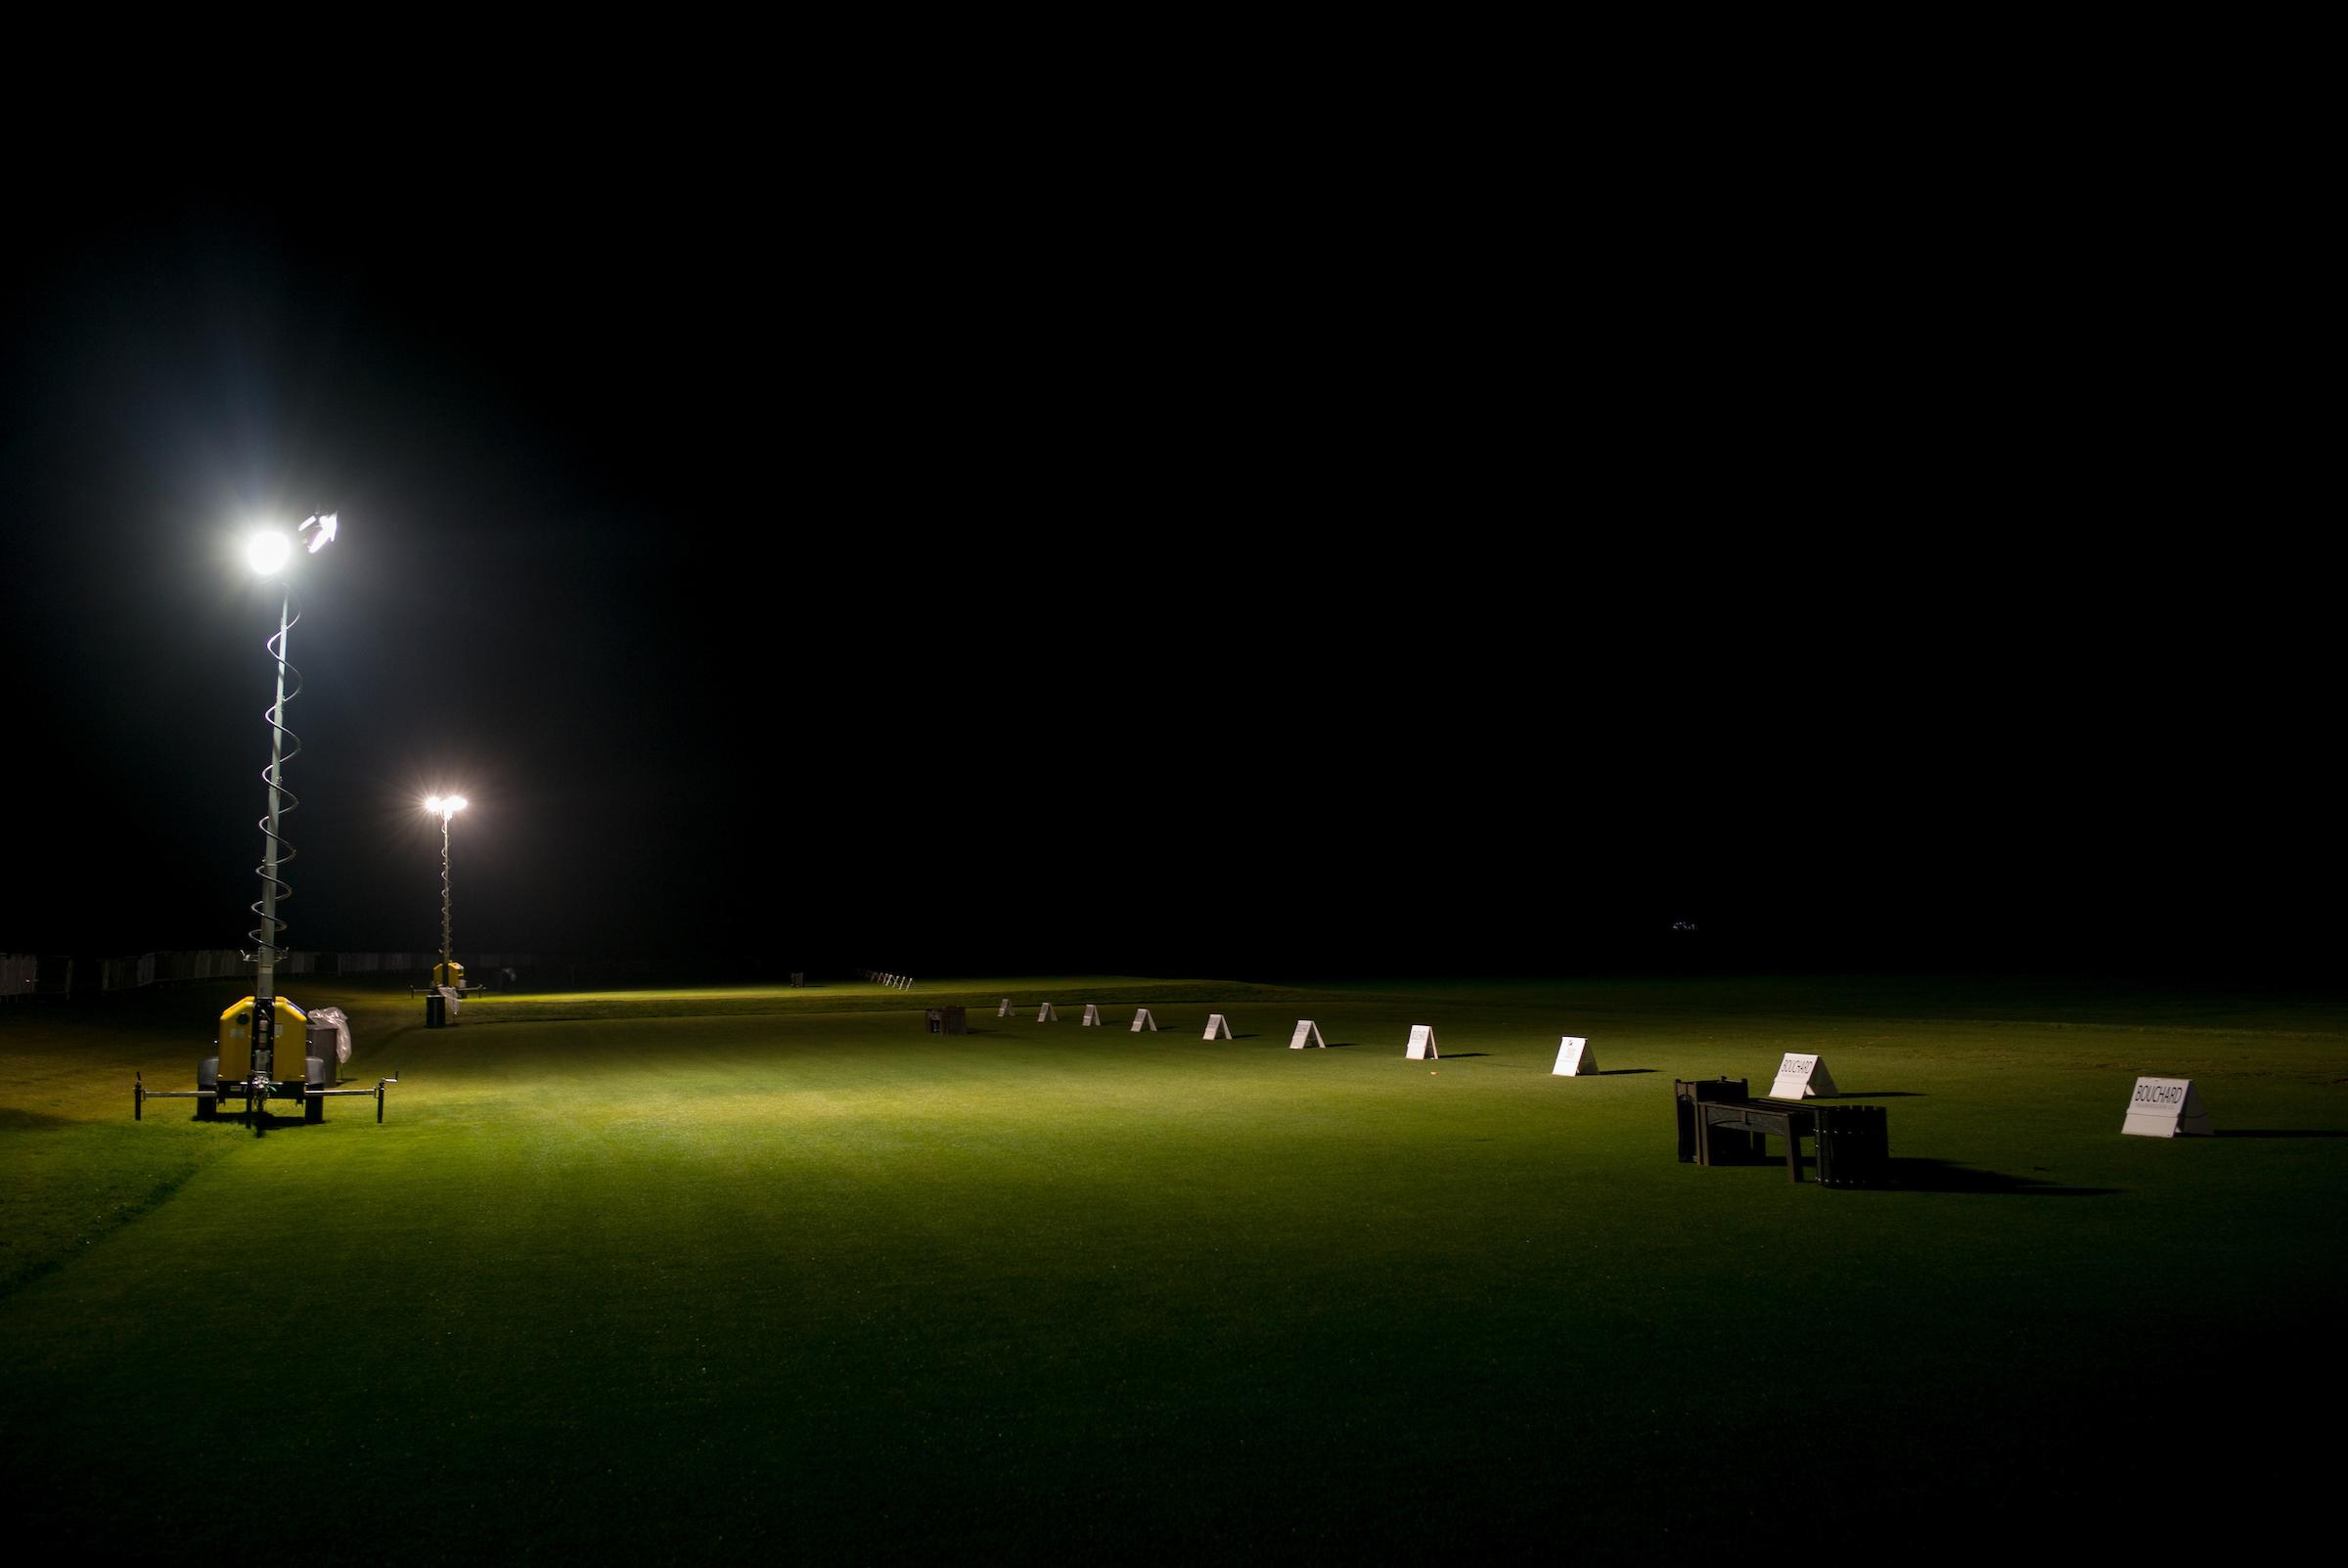 Driving range, 2015 Valero Texas Open. .  JW Marriott Hill Country Resort, San Antonio, Texas. Canon 1DX, Canon EF 24-70mm f2.8L